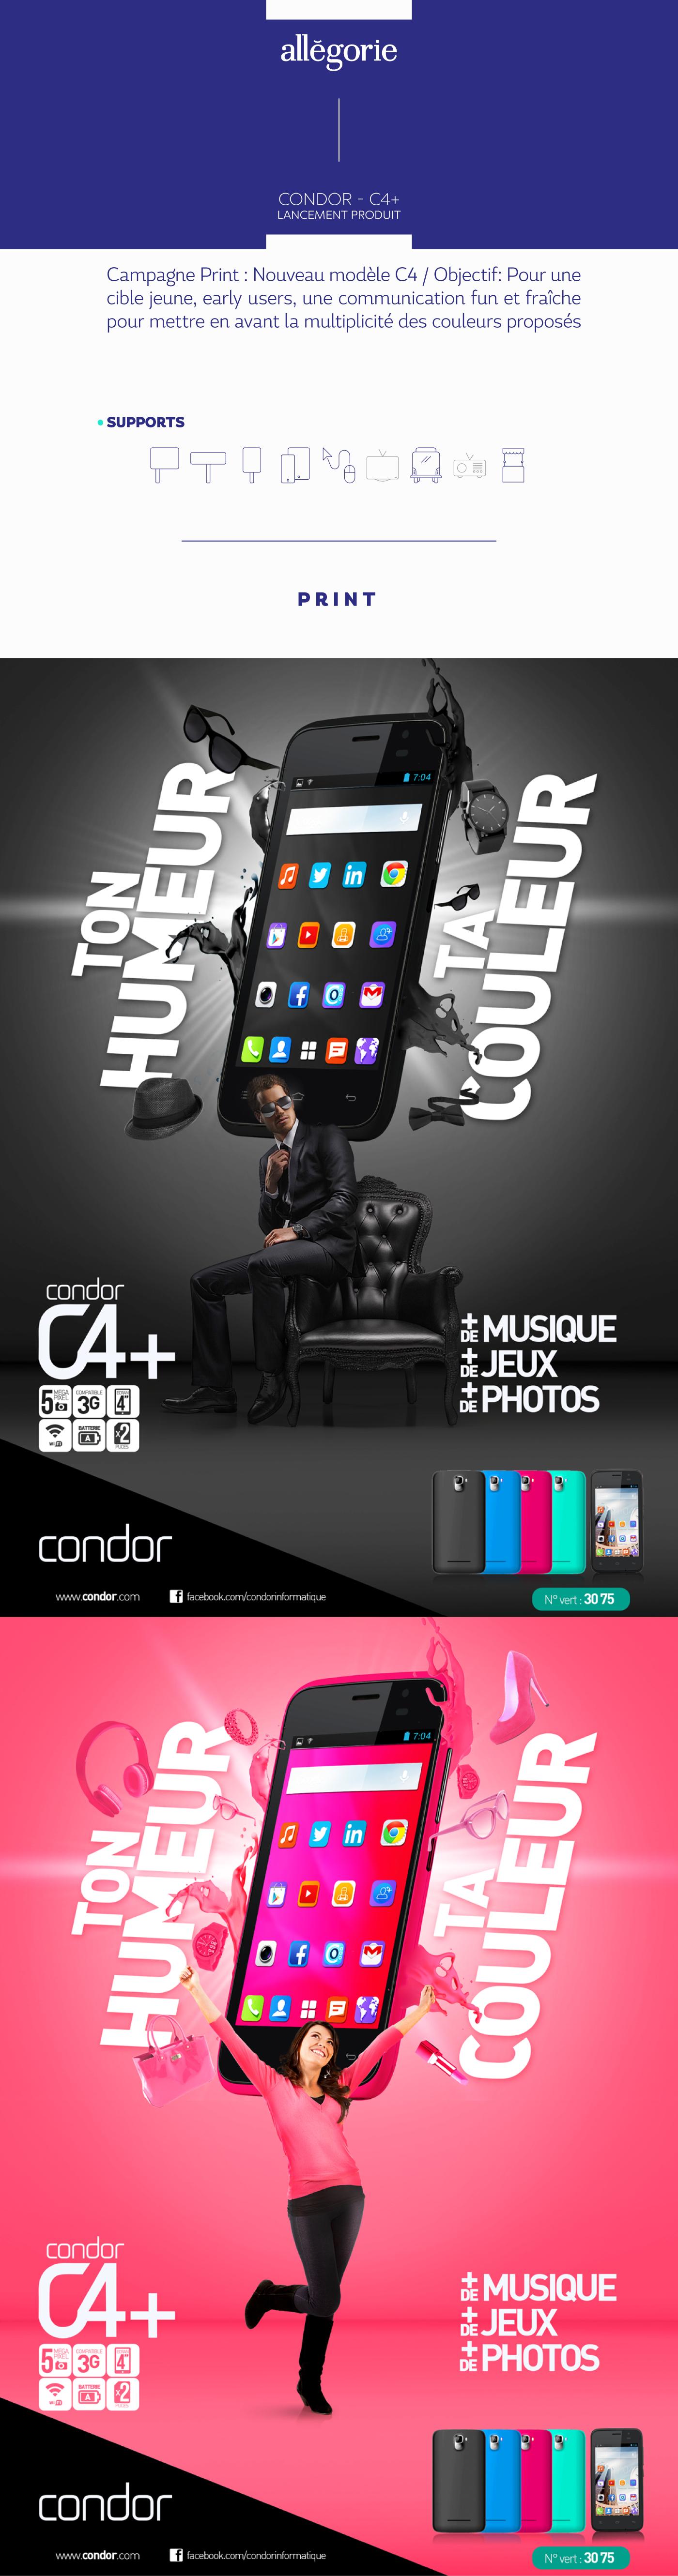 condor,phone,smartphone,Algeria,Awards,colors,Style